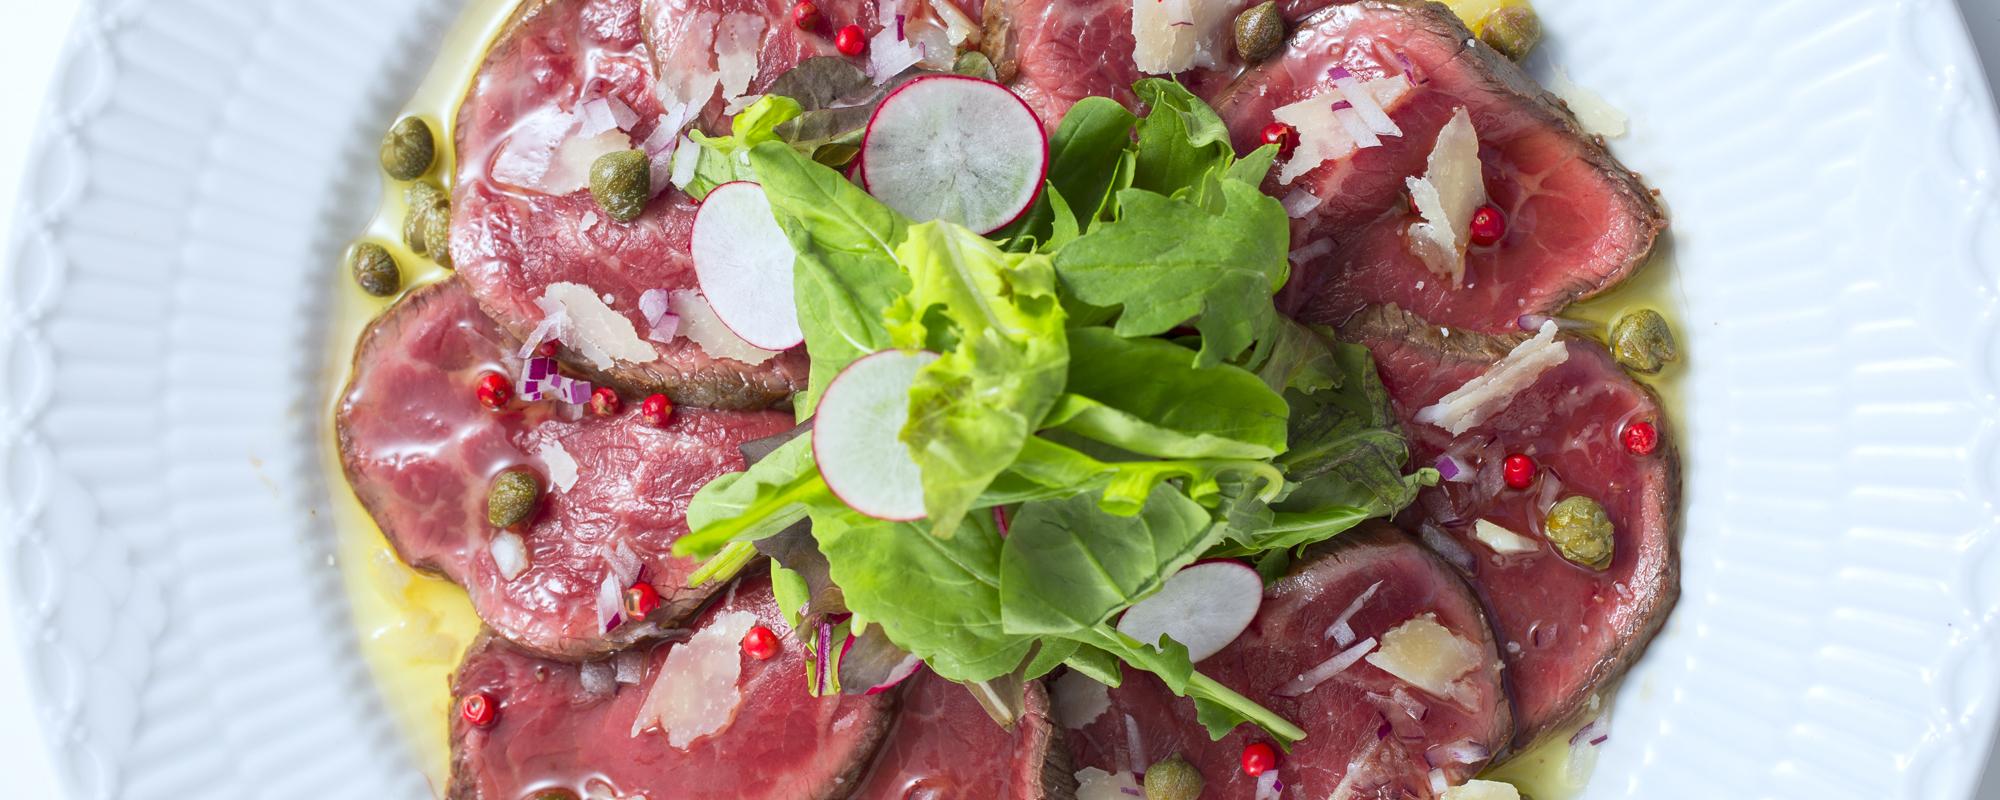 Olive-fed Wagyu Beef